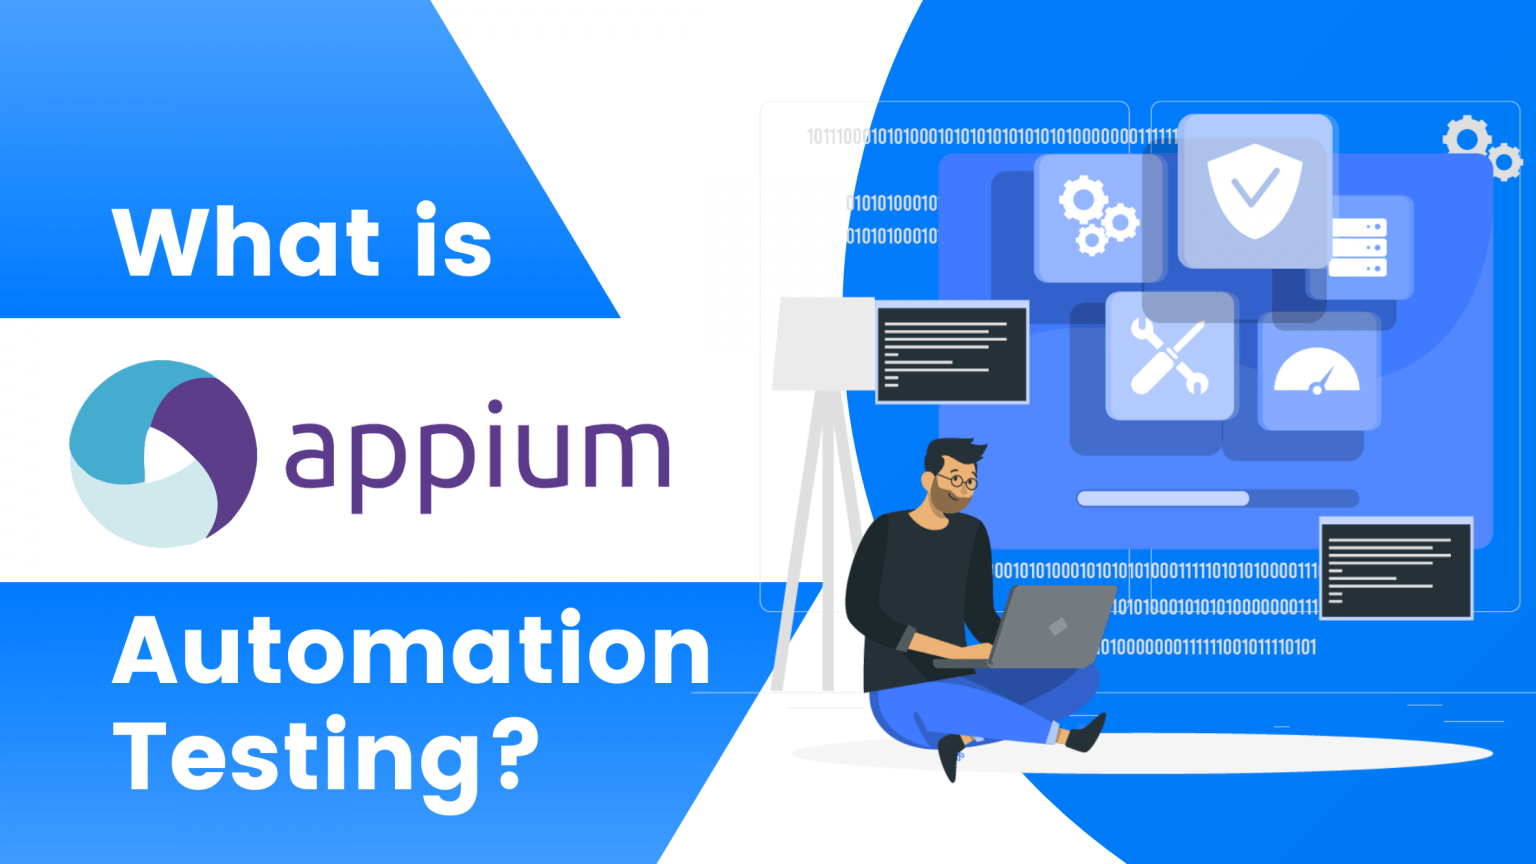 Appium Automation Testing company